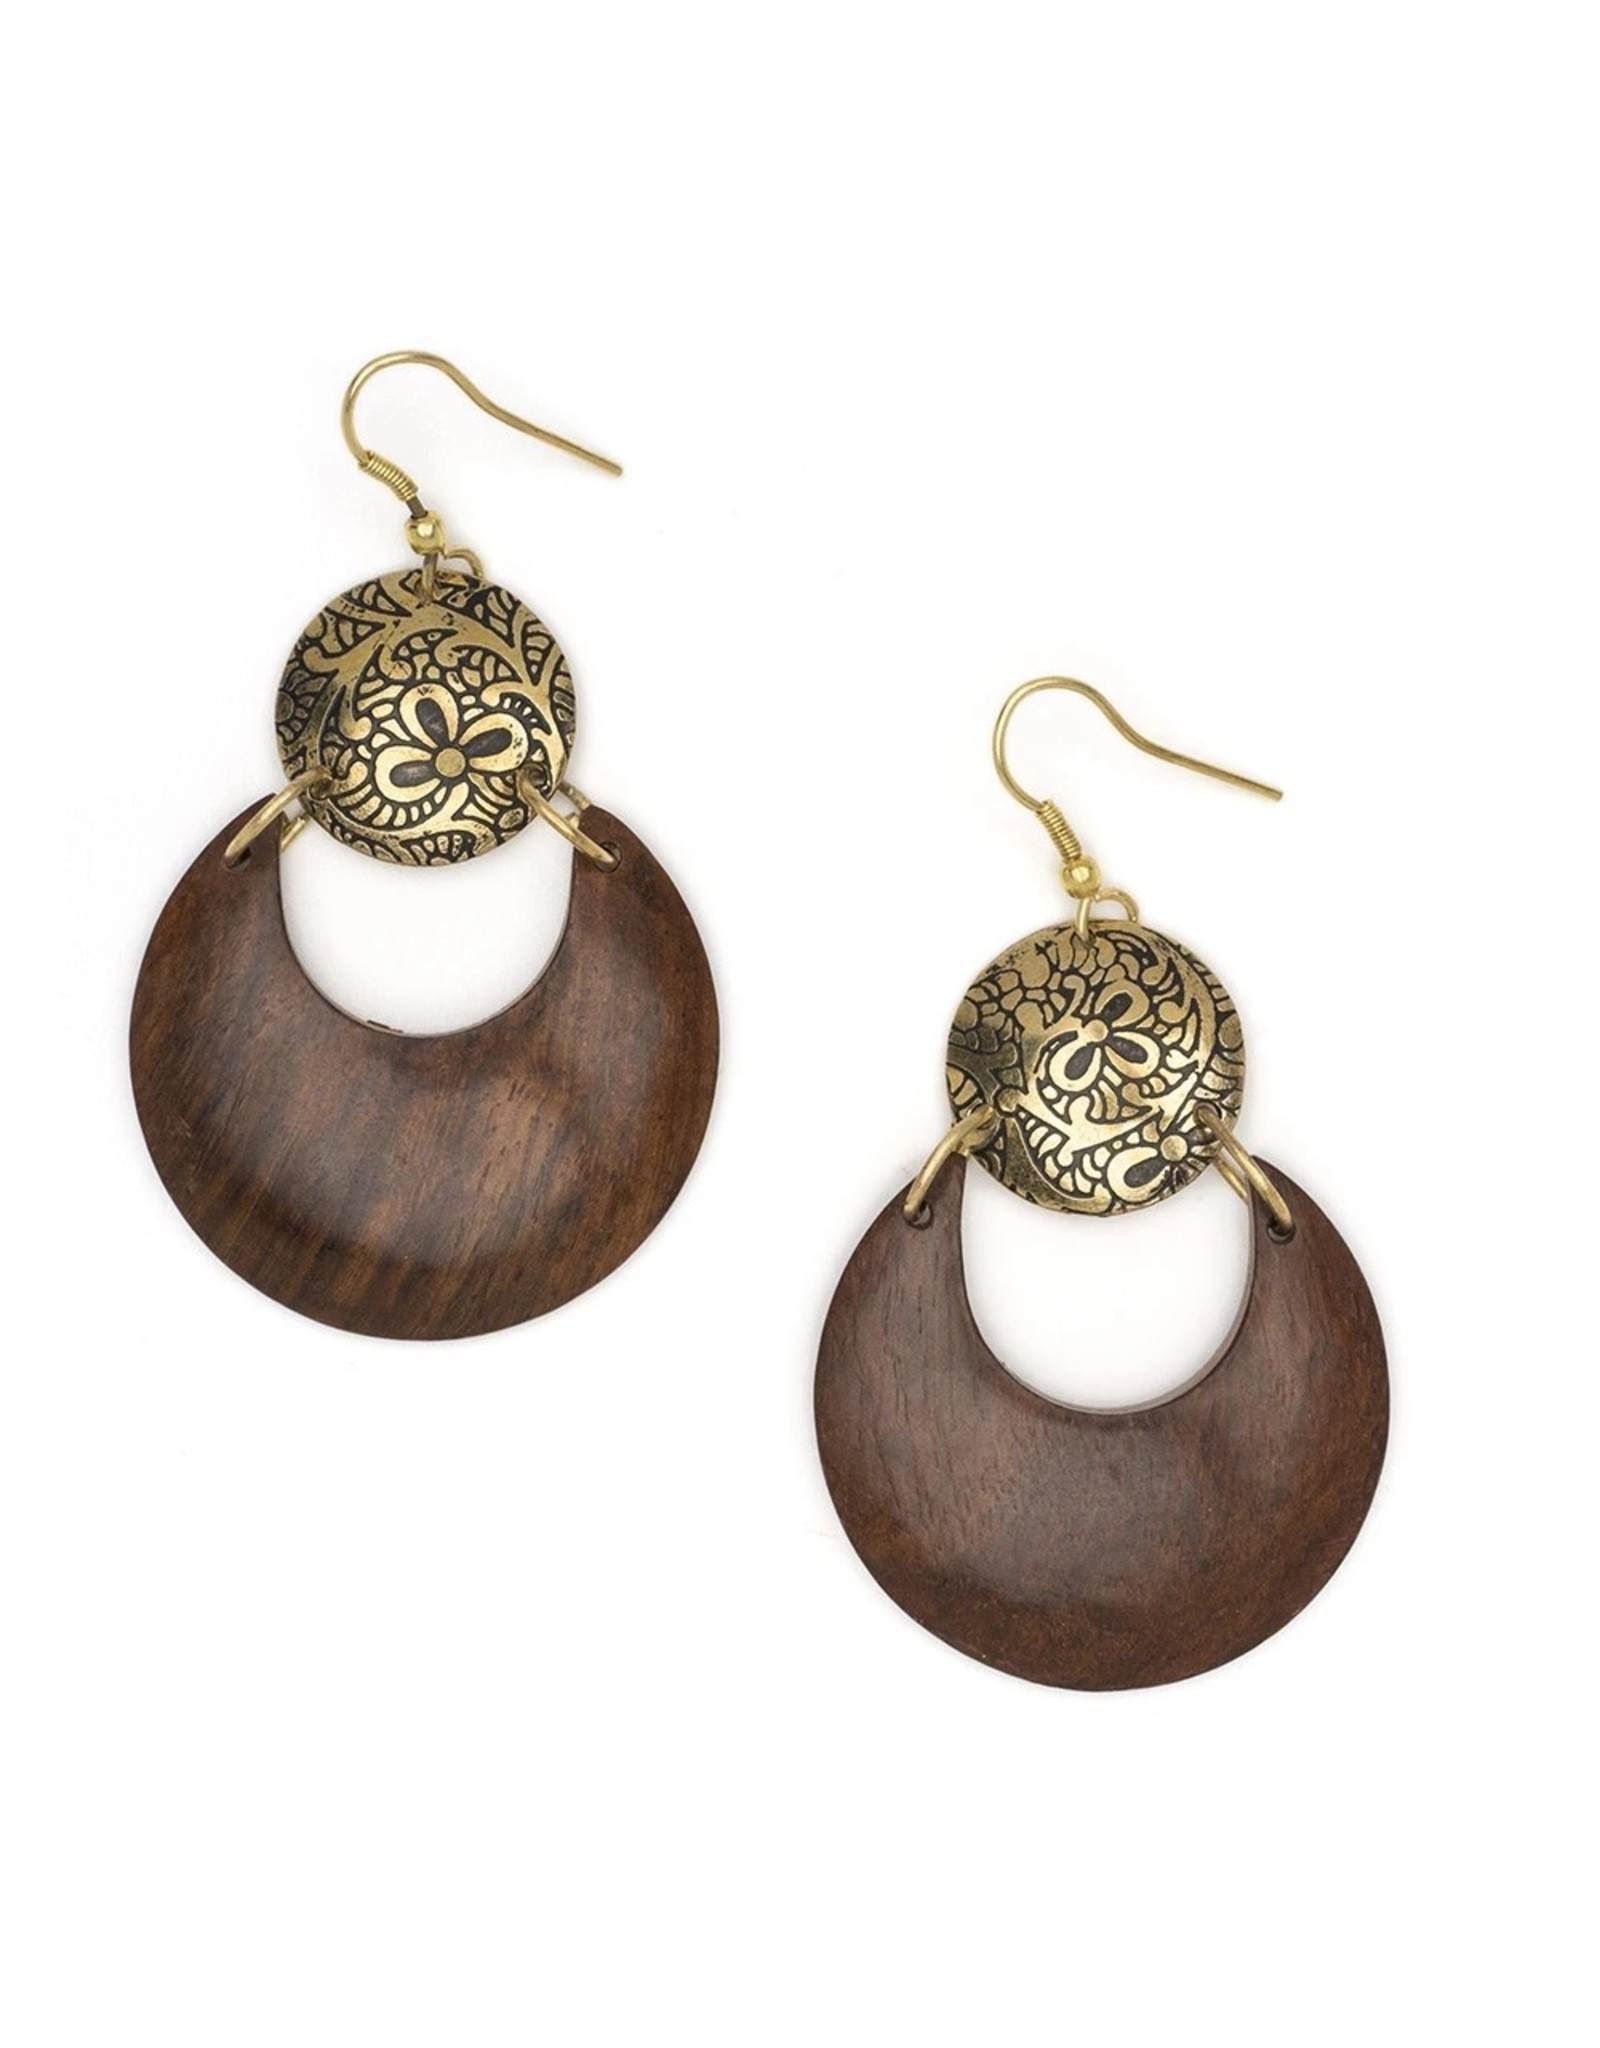 Matr Boomie Lunar Earrings